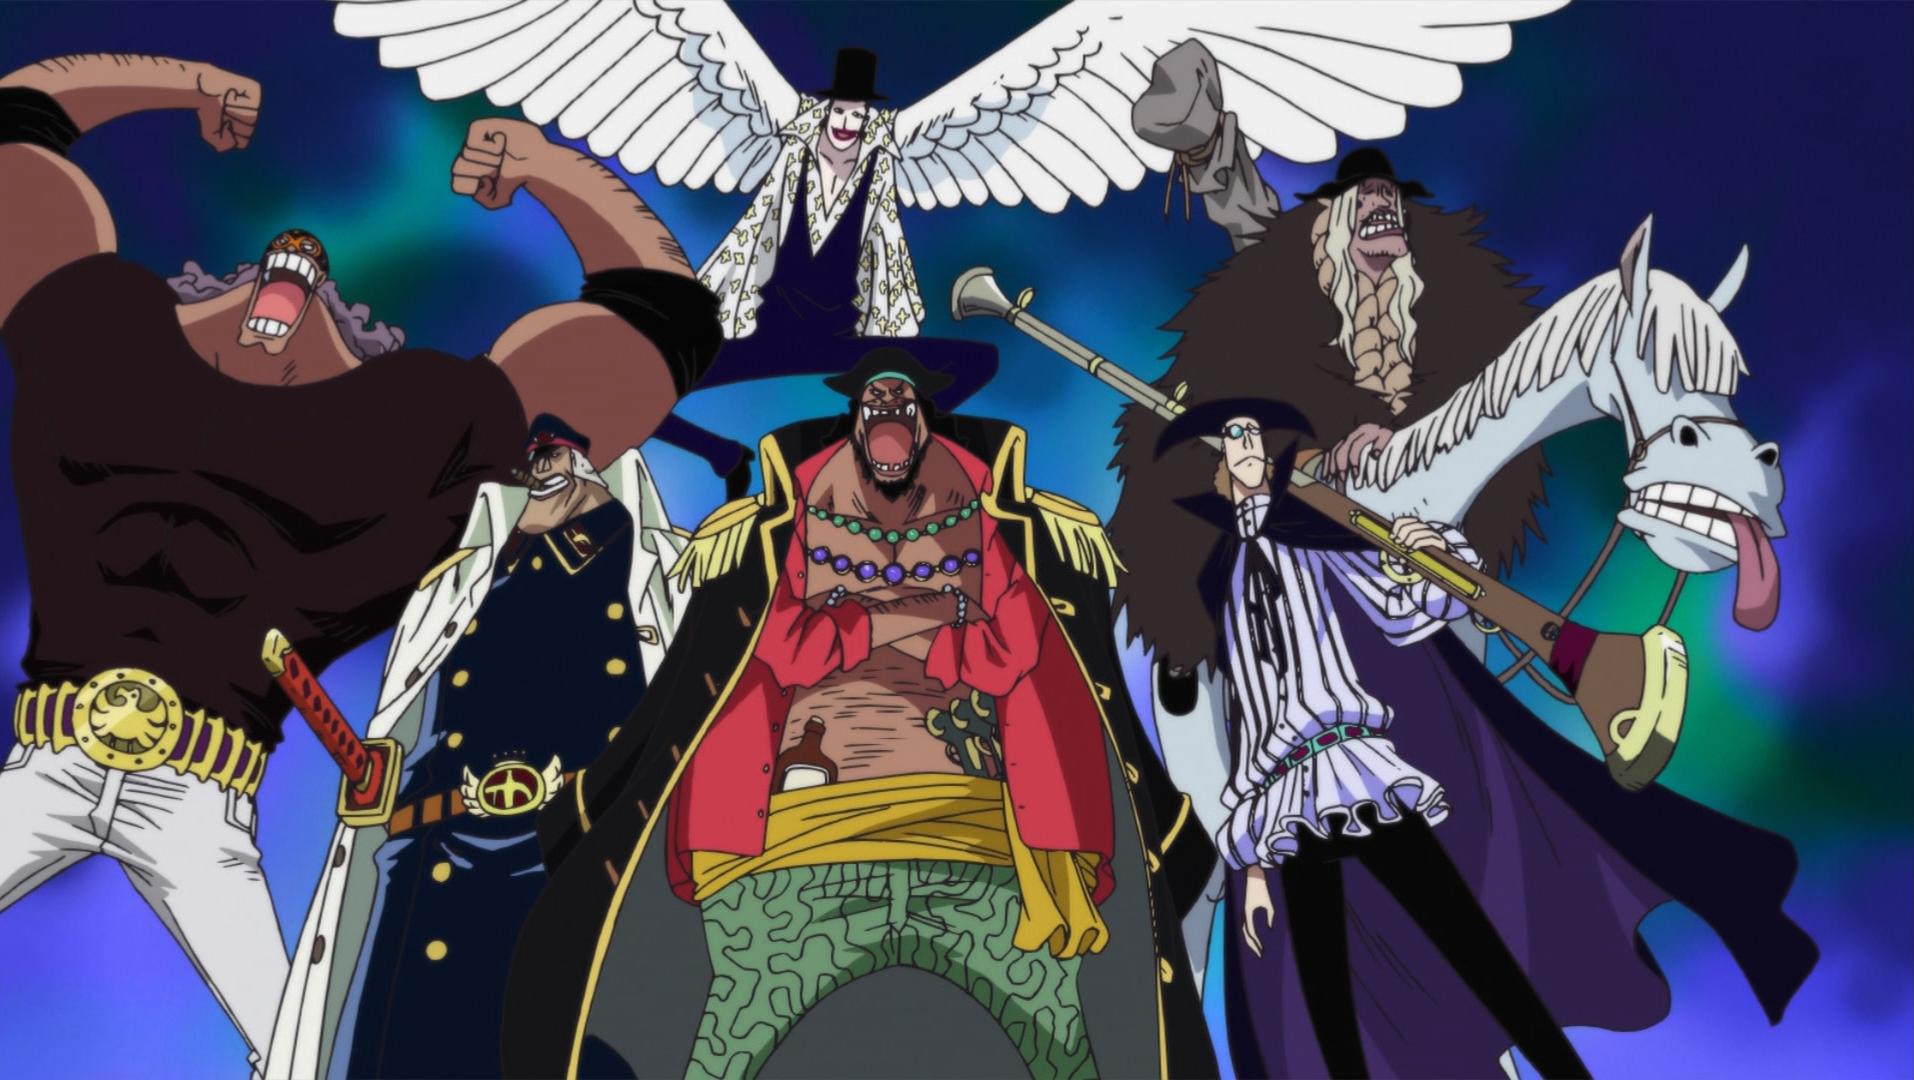 Aokiji As A Blackbeard Pirate Pfftt